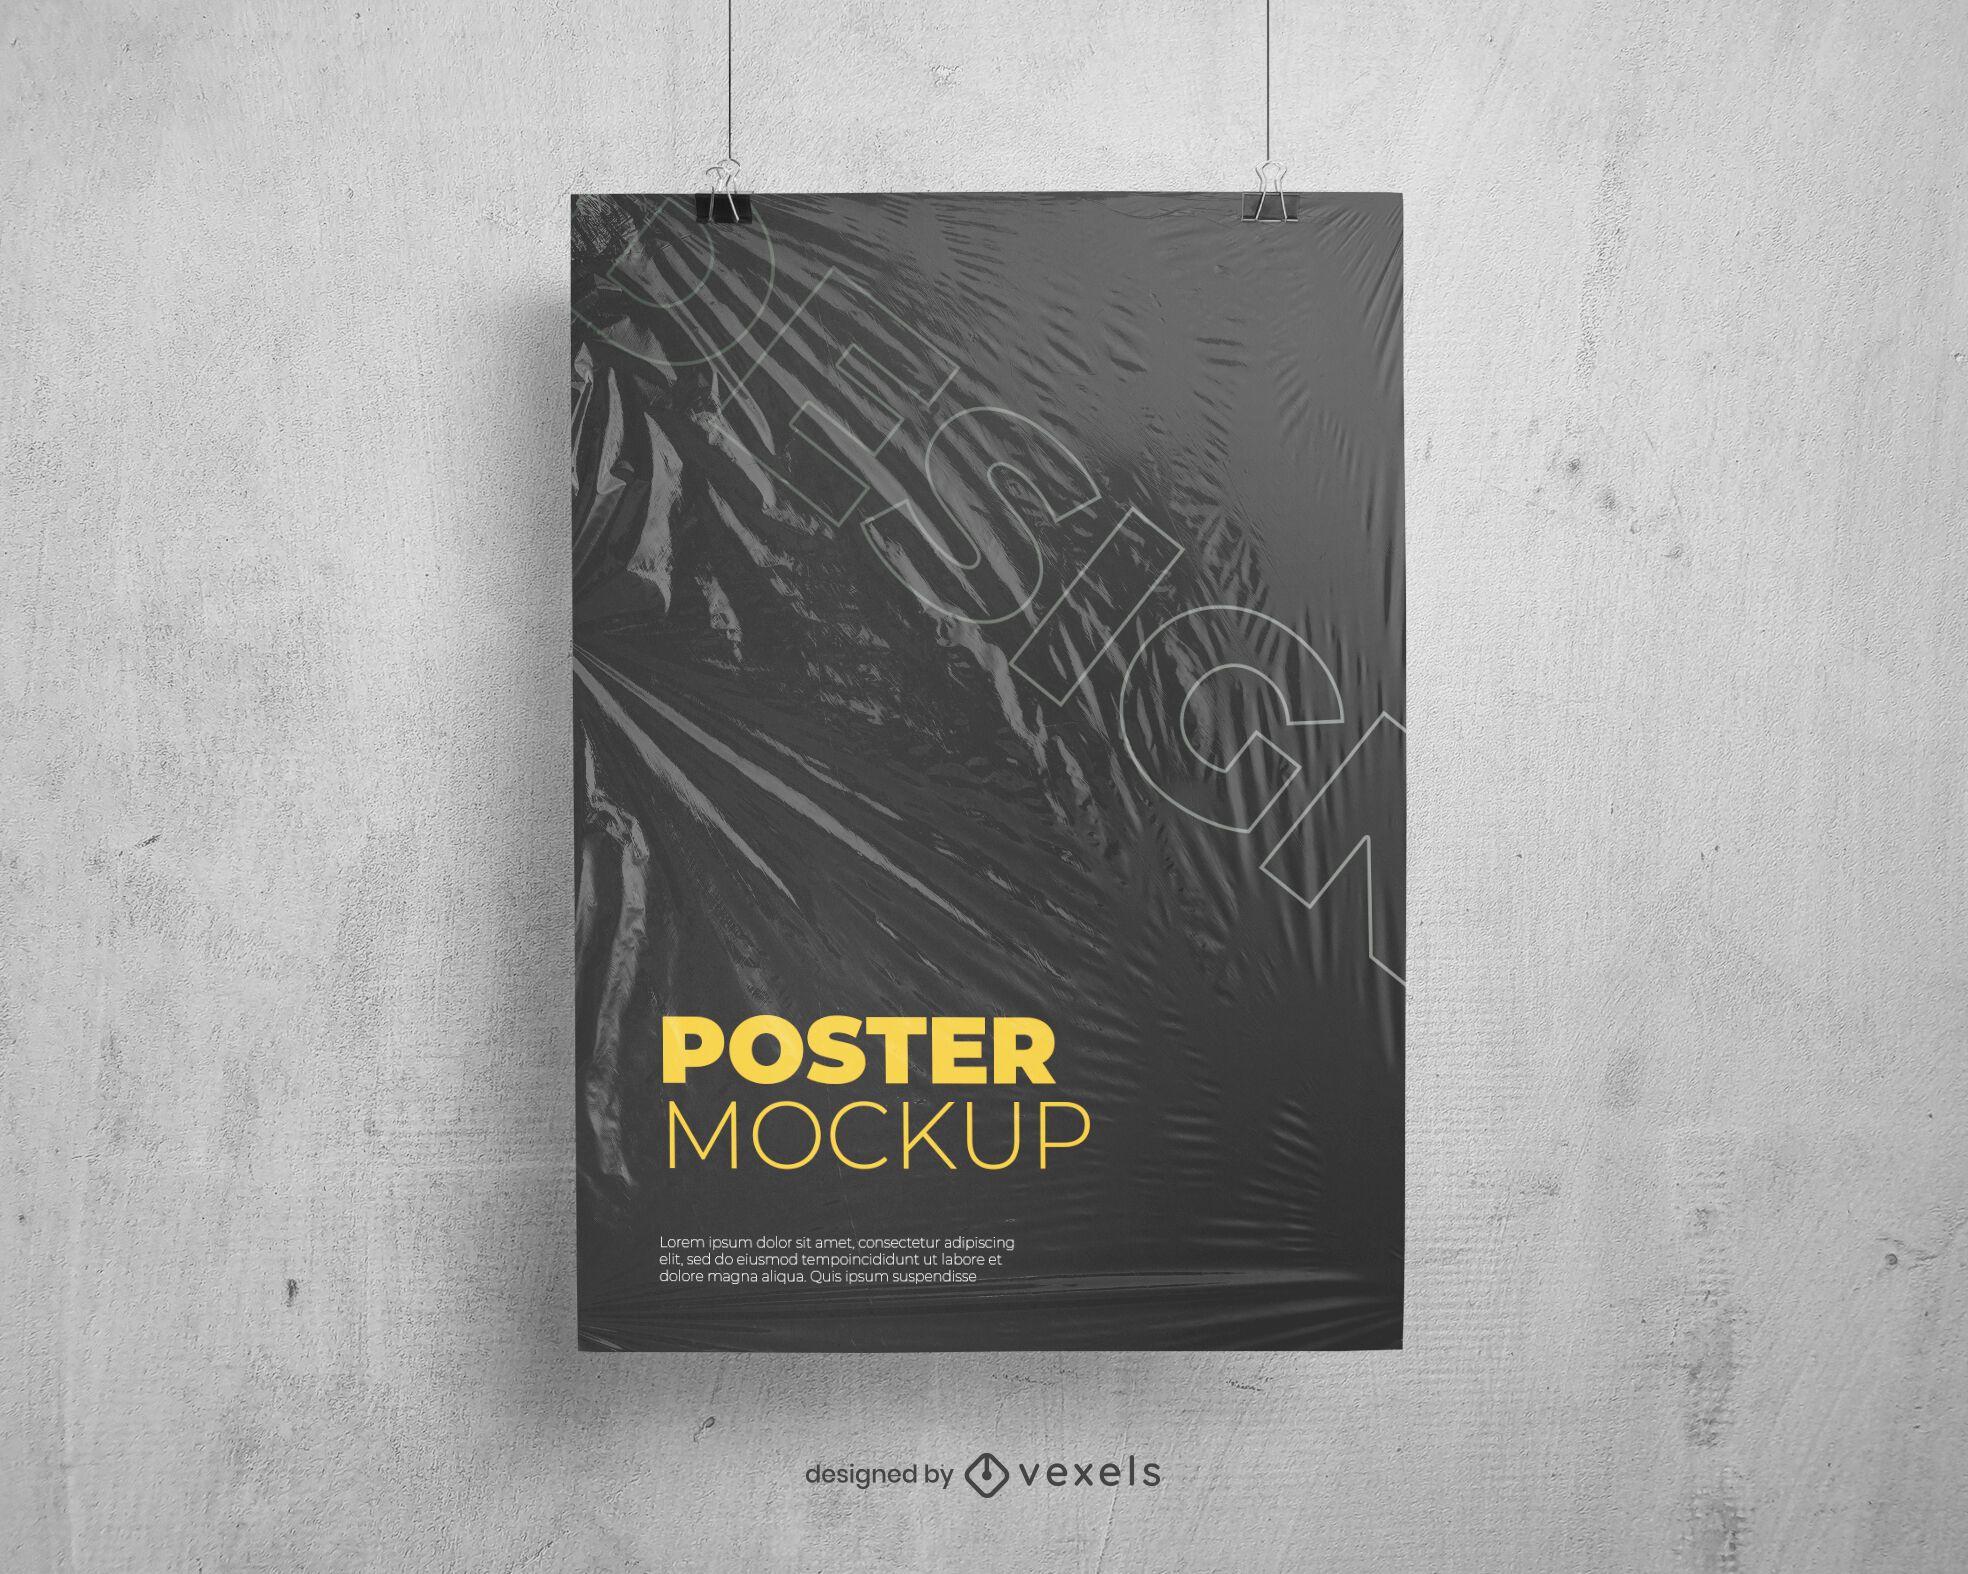 plastic texture poster mockup